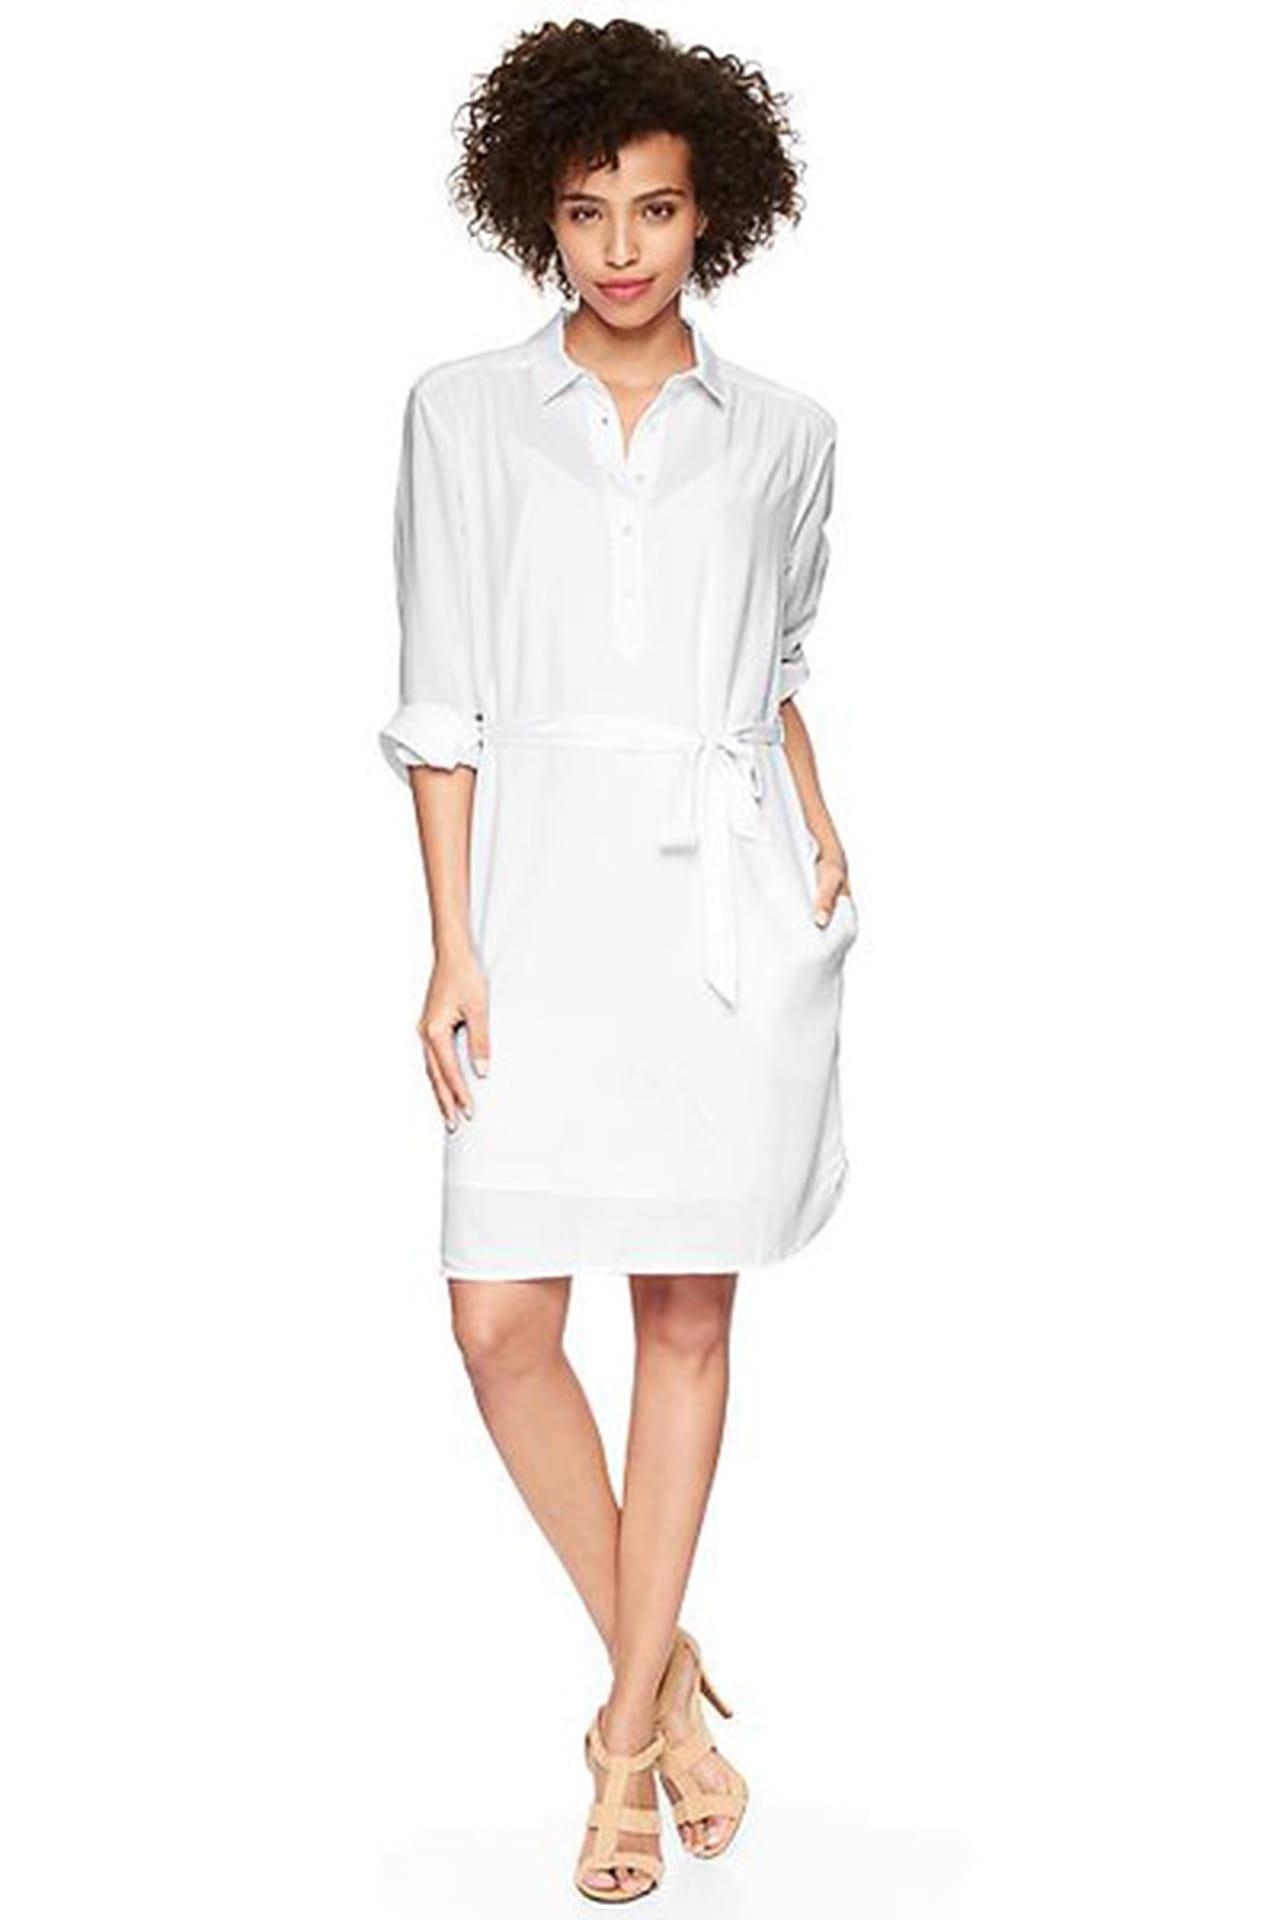 c4939d09b6b58 فستان أبيض مريح من Gap. فستان أبيض من Gap. من موضة صيف 2013